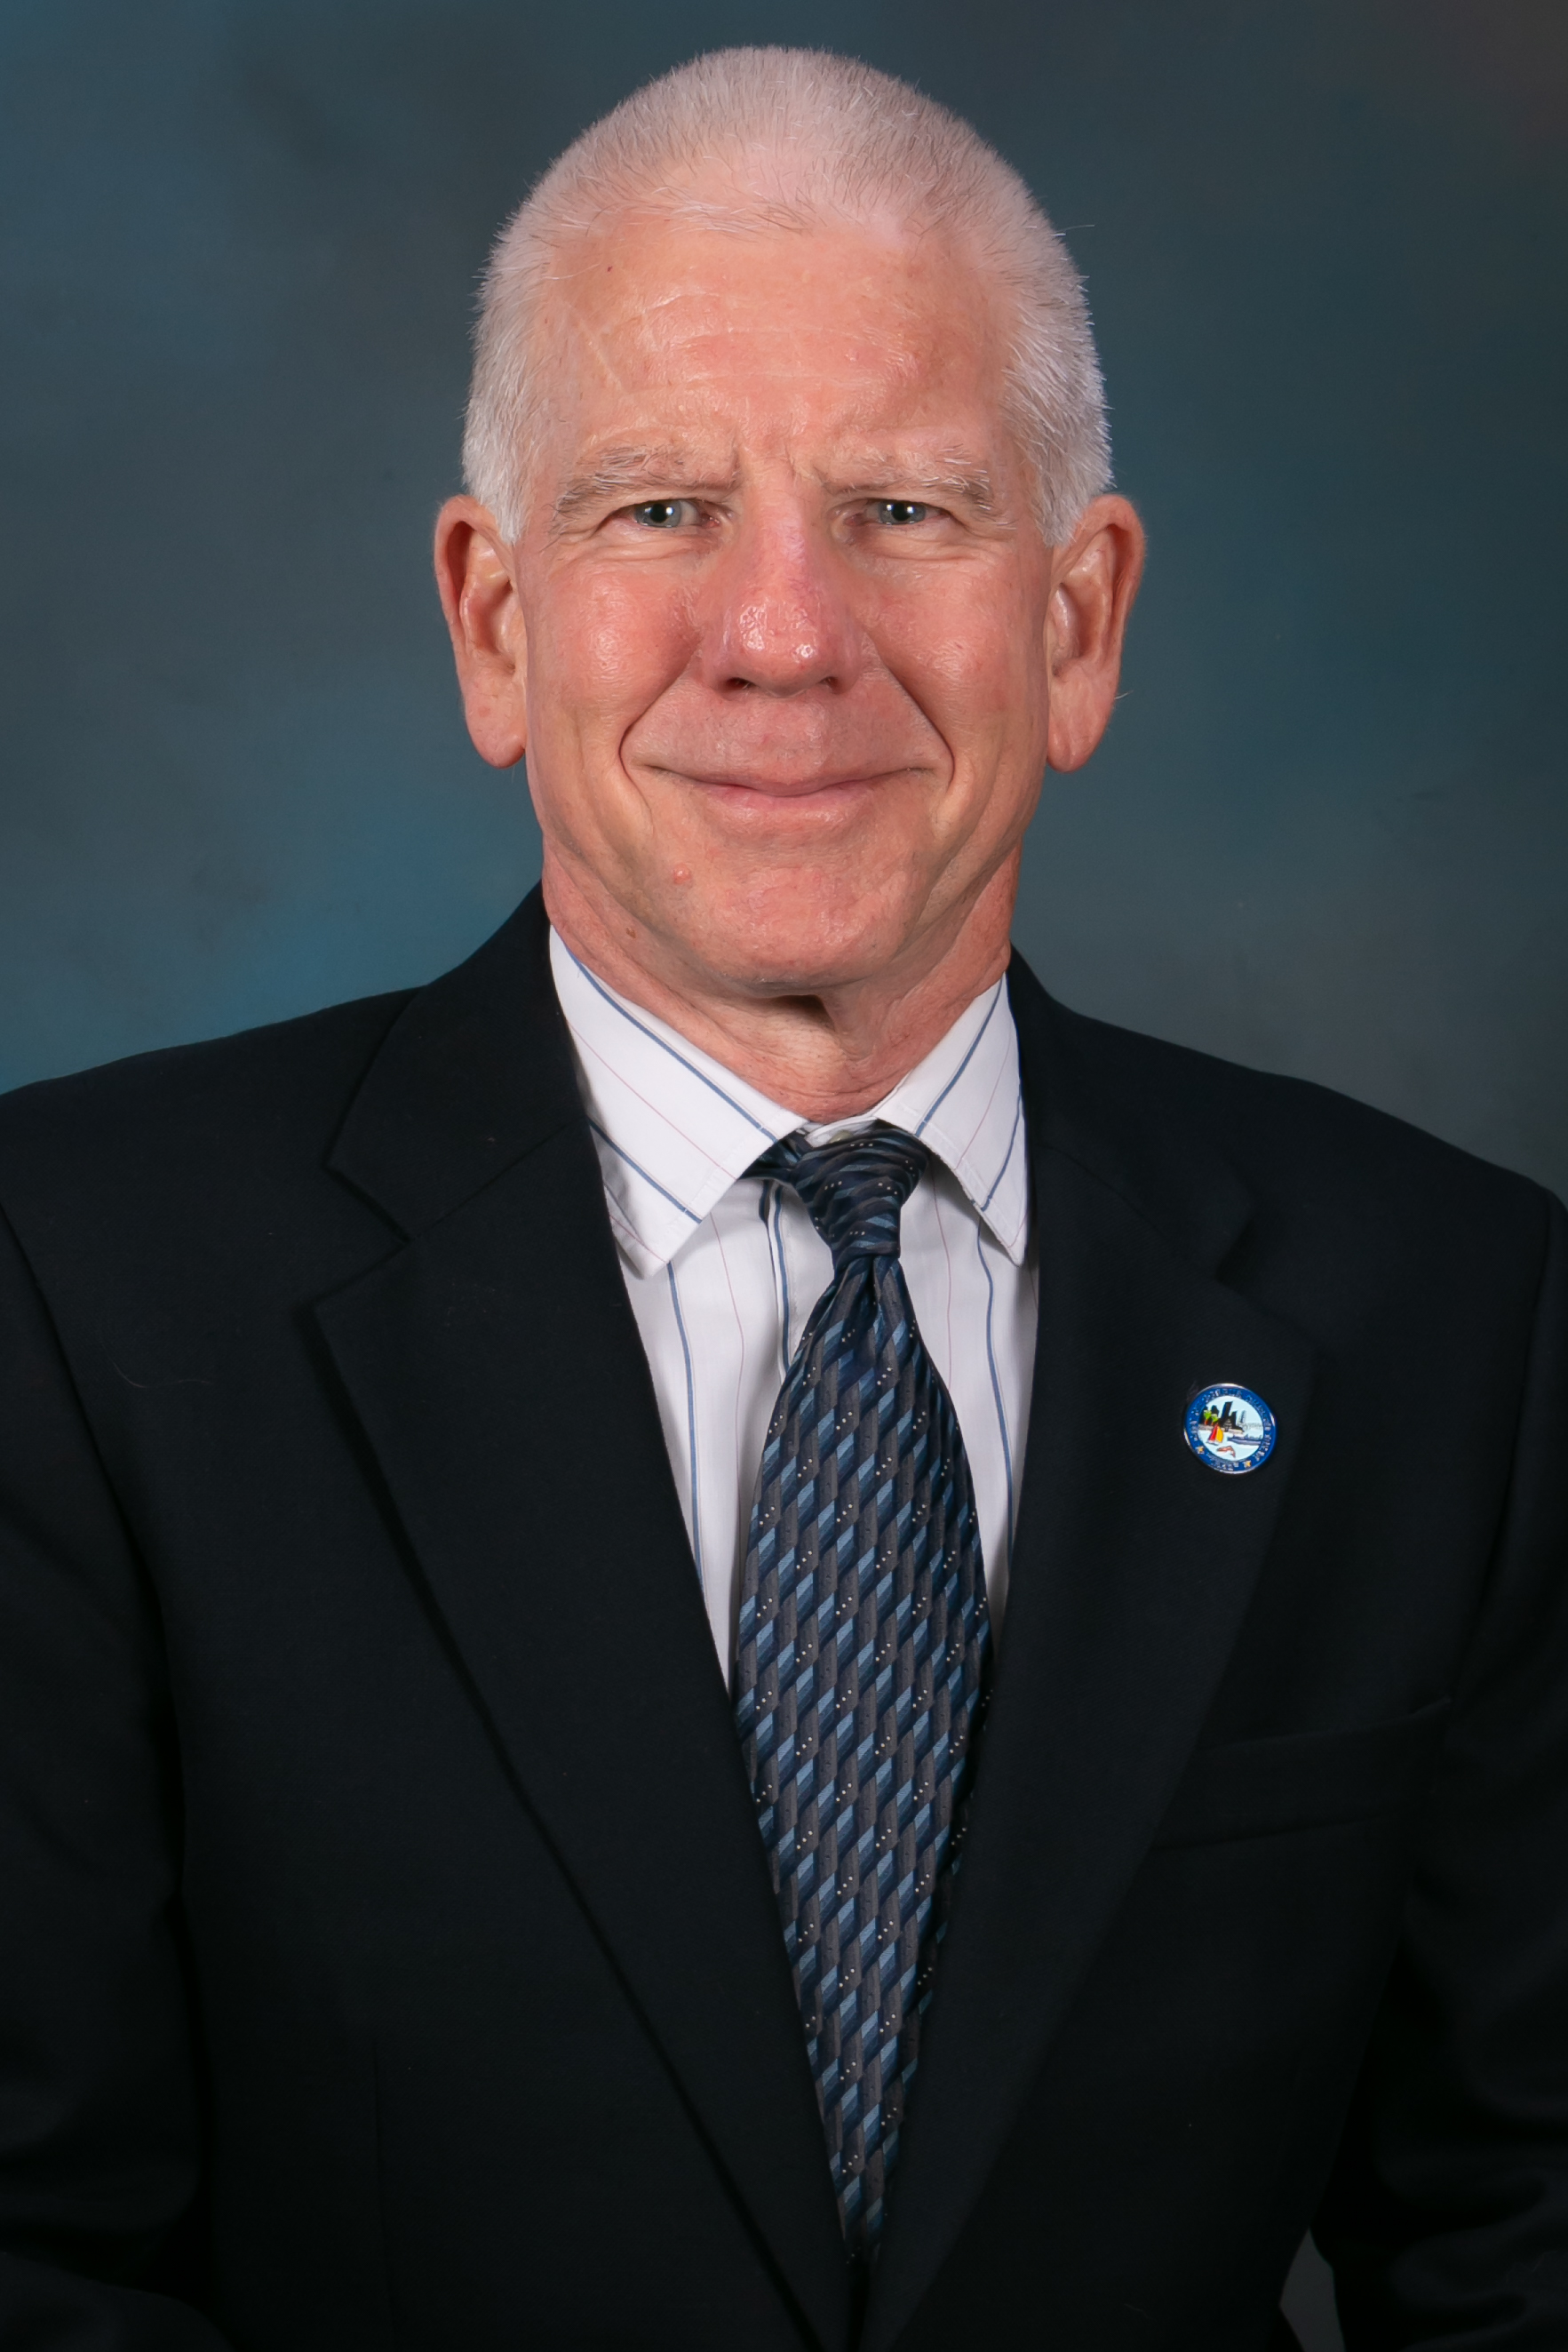 Eddie Houlihan, Director of Budget and Strategic Management